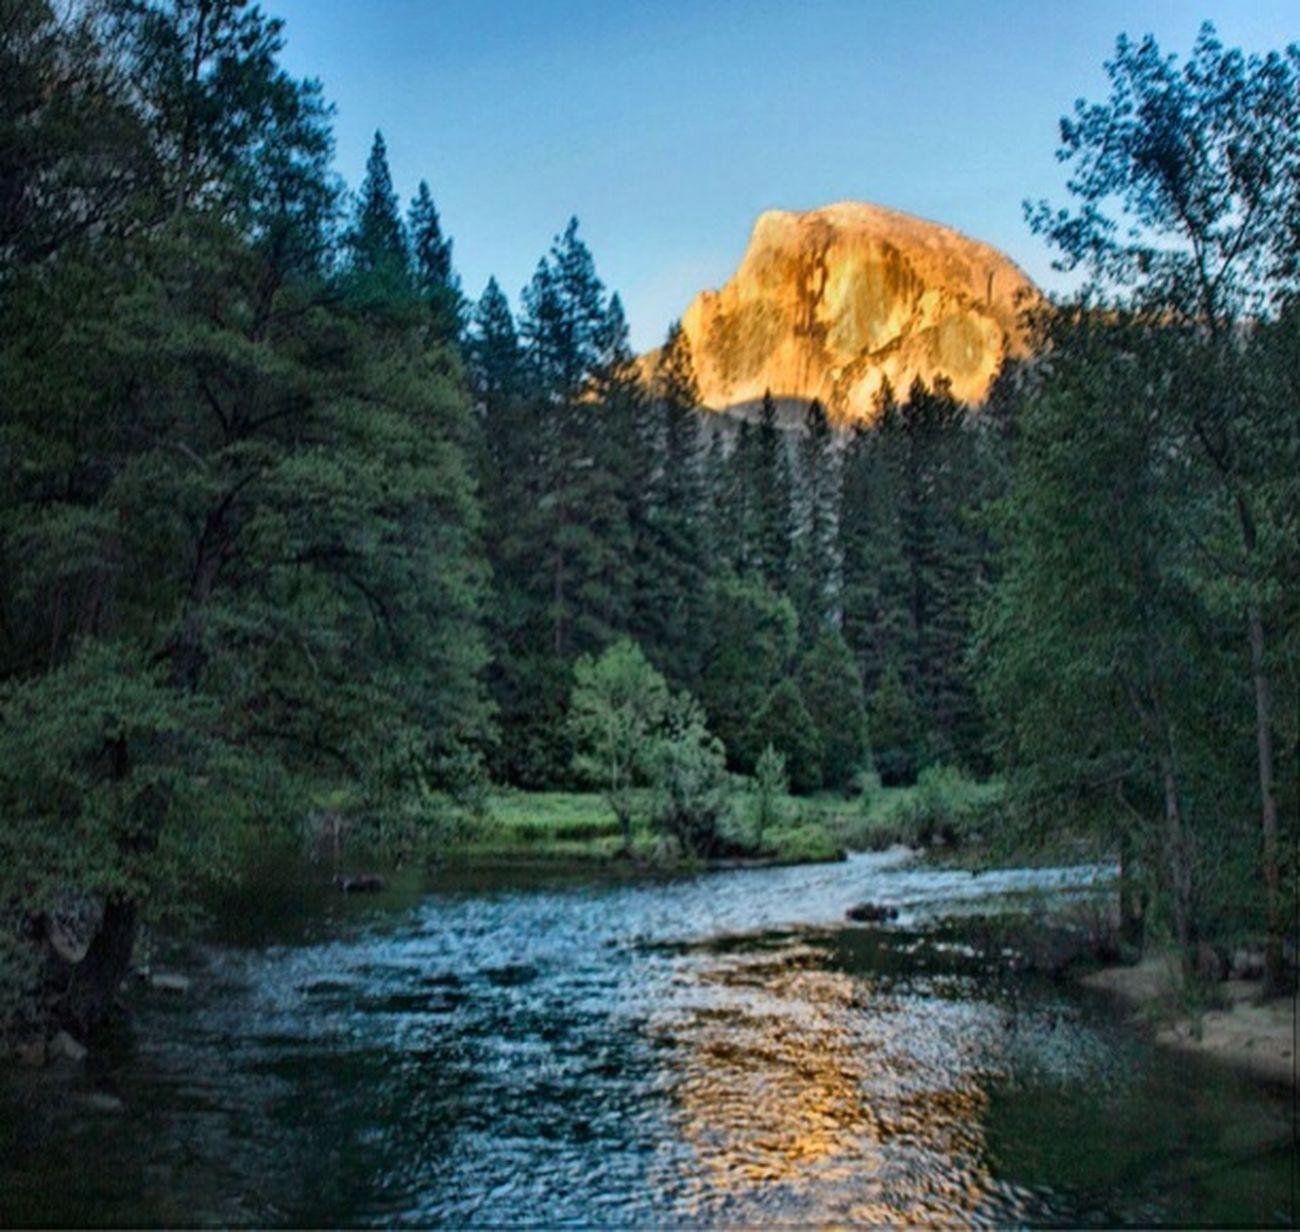 Yosemite Gold. Wilderness EyeNatureLover Sunset #skyporn #cloudporn # Bestskyever #gorgeous # Beautiful #stunning Eye4nature